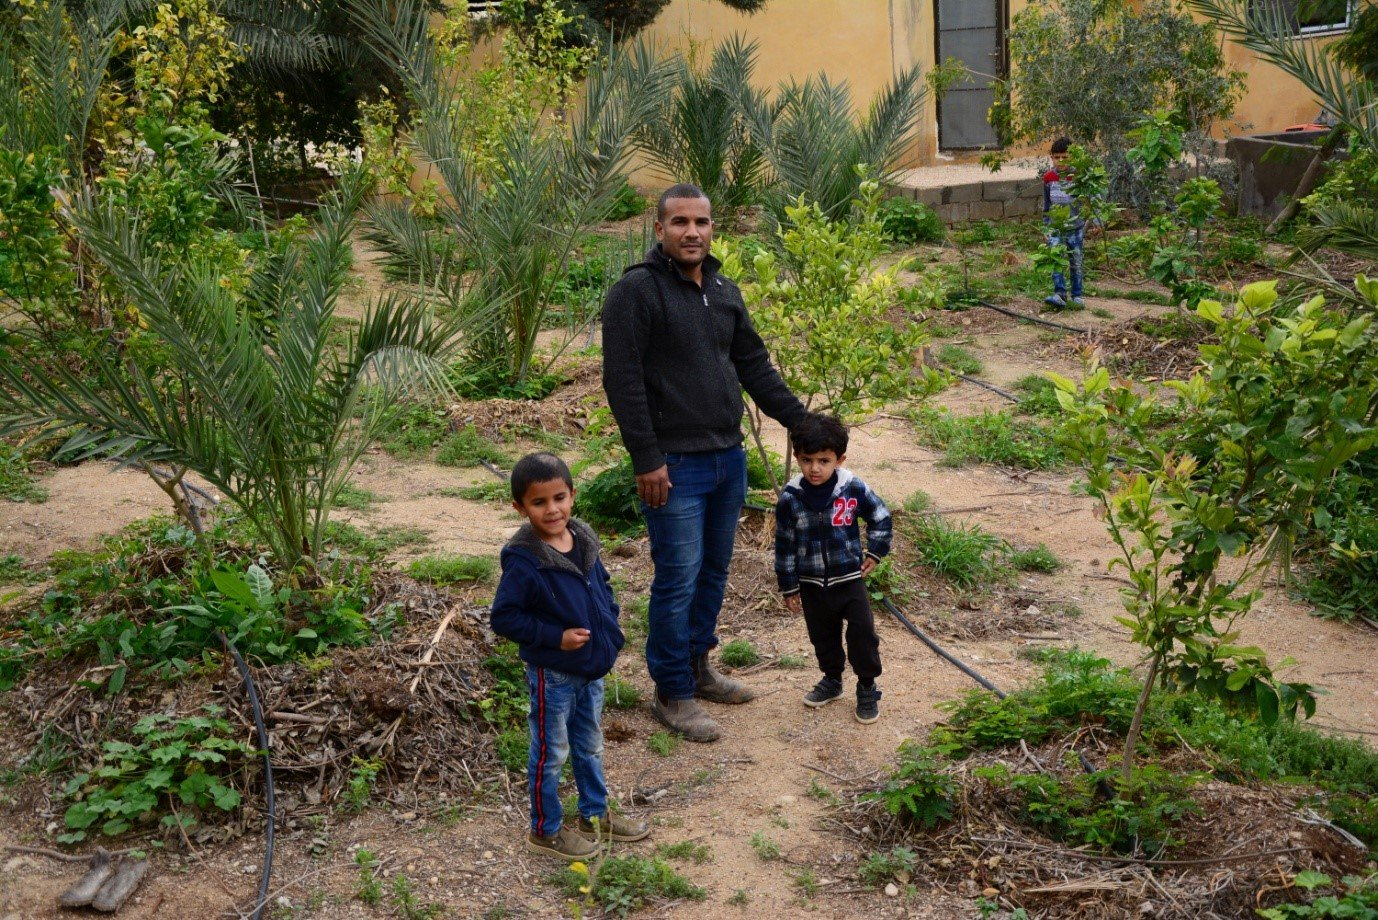 Hayel Abu Yahya and his family manage Greening the Desert's farm. (Marta Vidal/MEE)